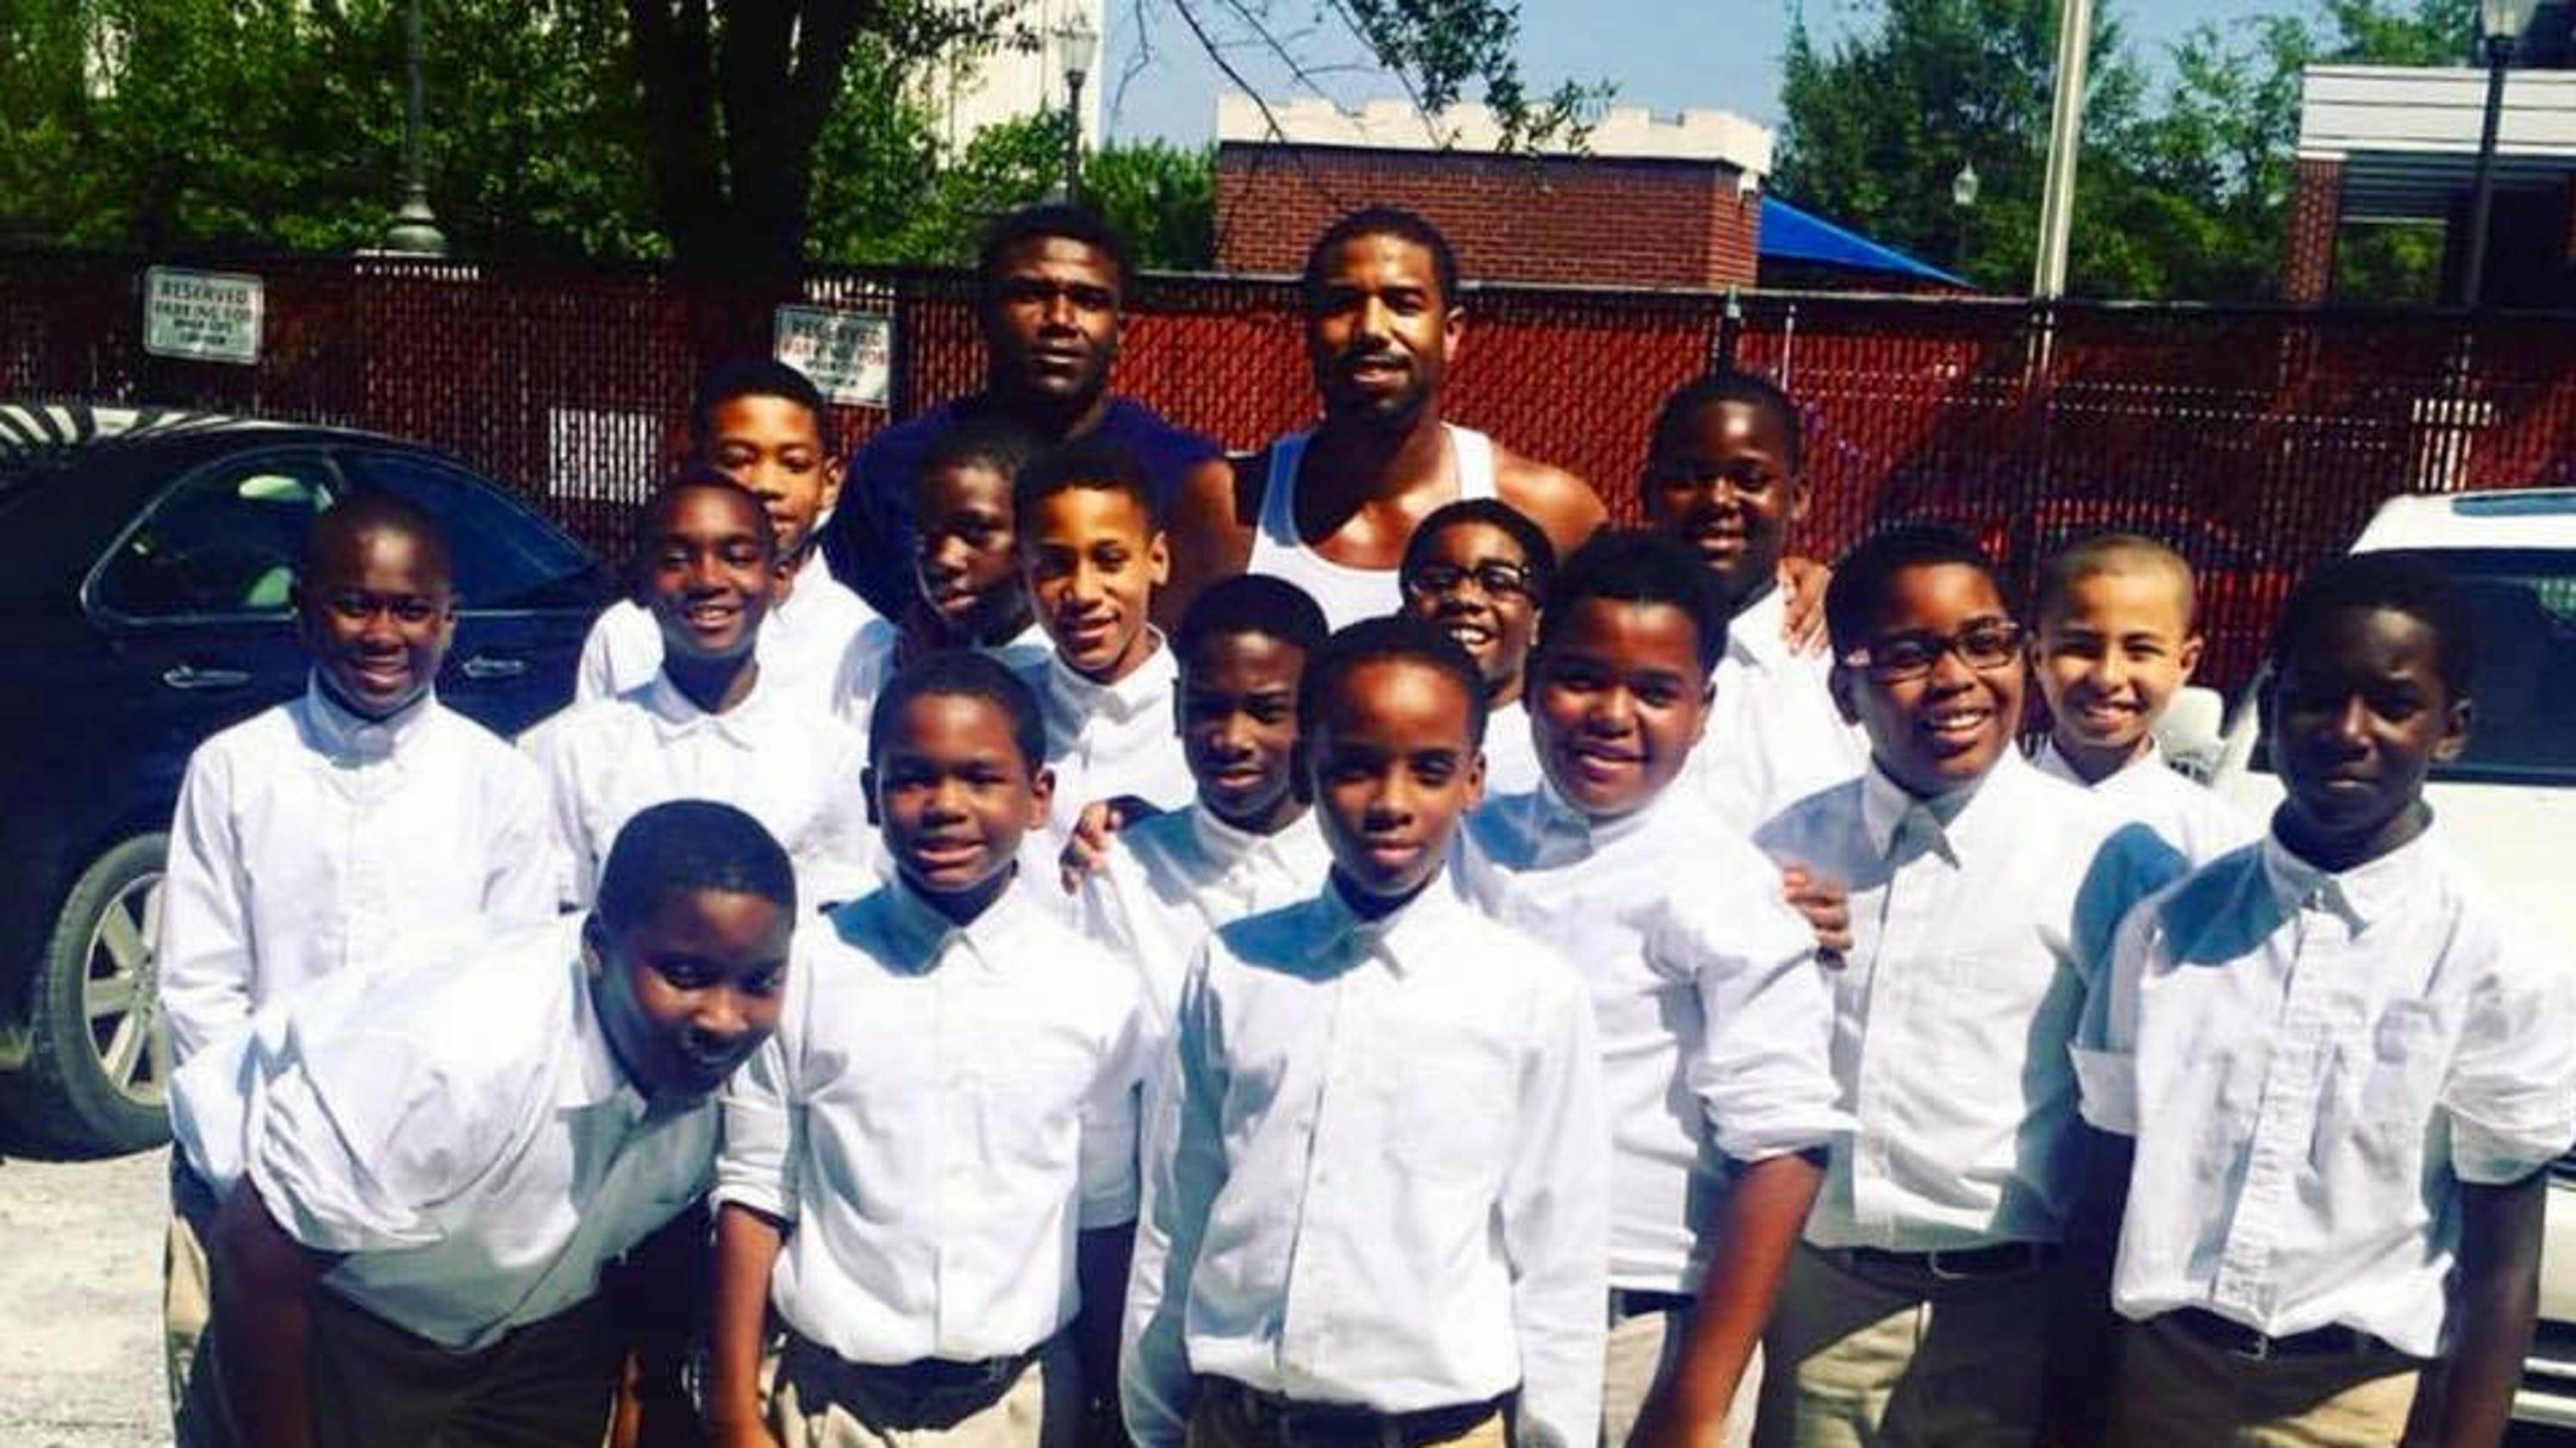 3ee1dbdadbe383  Black Panther  star Michael B. Jordan visits Montgomery school during  Just  Mercy  filming